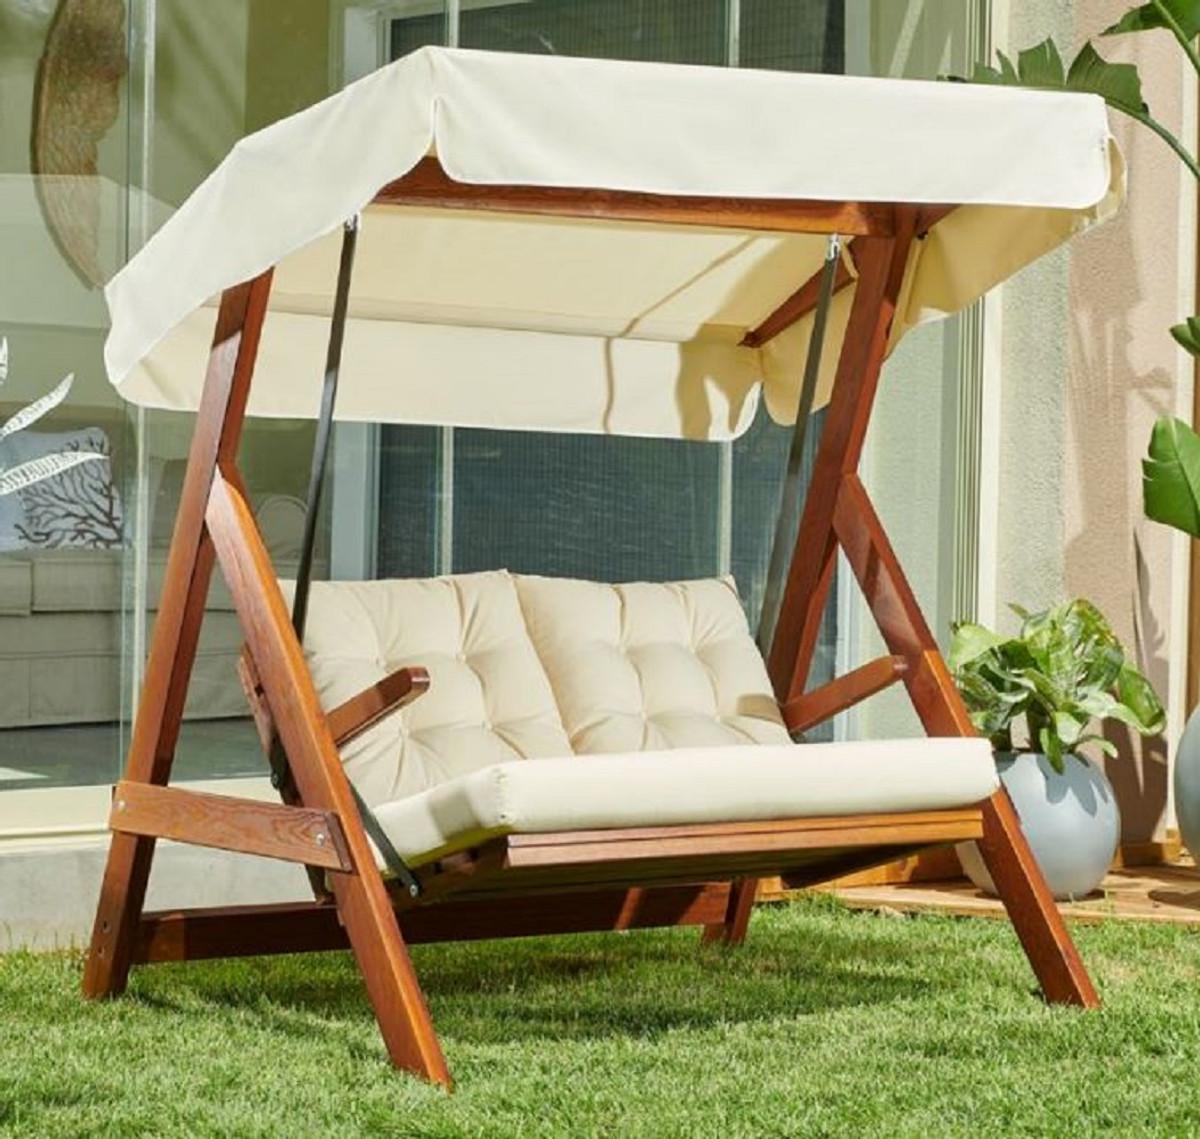 casa padrino luxury hollywood swing cream brown modern weatherproof garden swing with sun roof patio furniture garden furniture